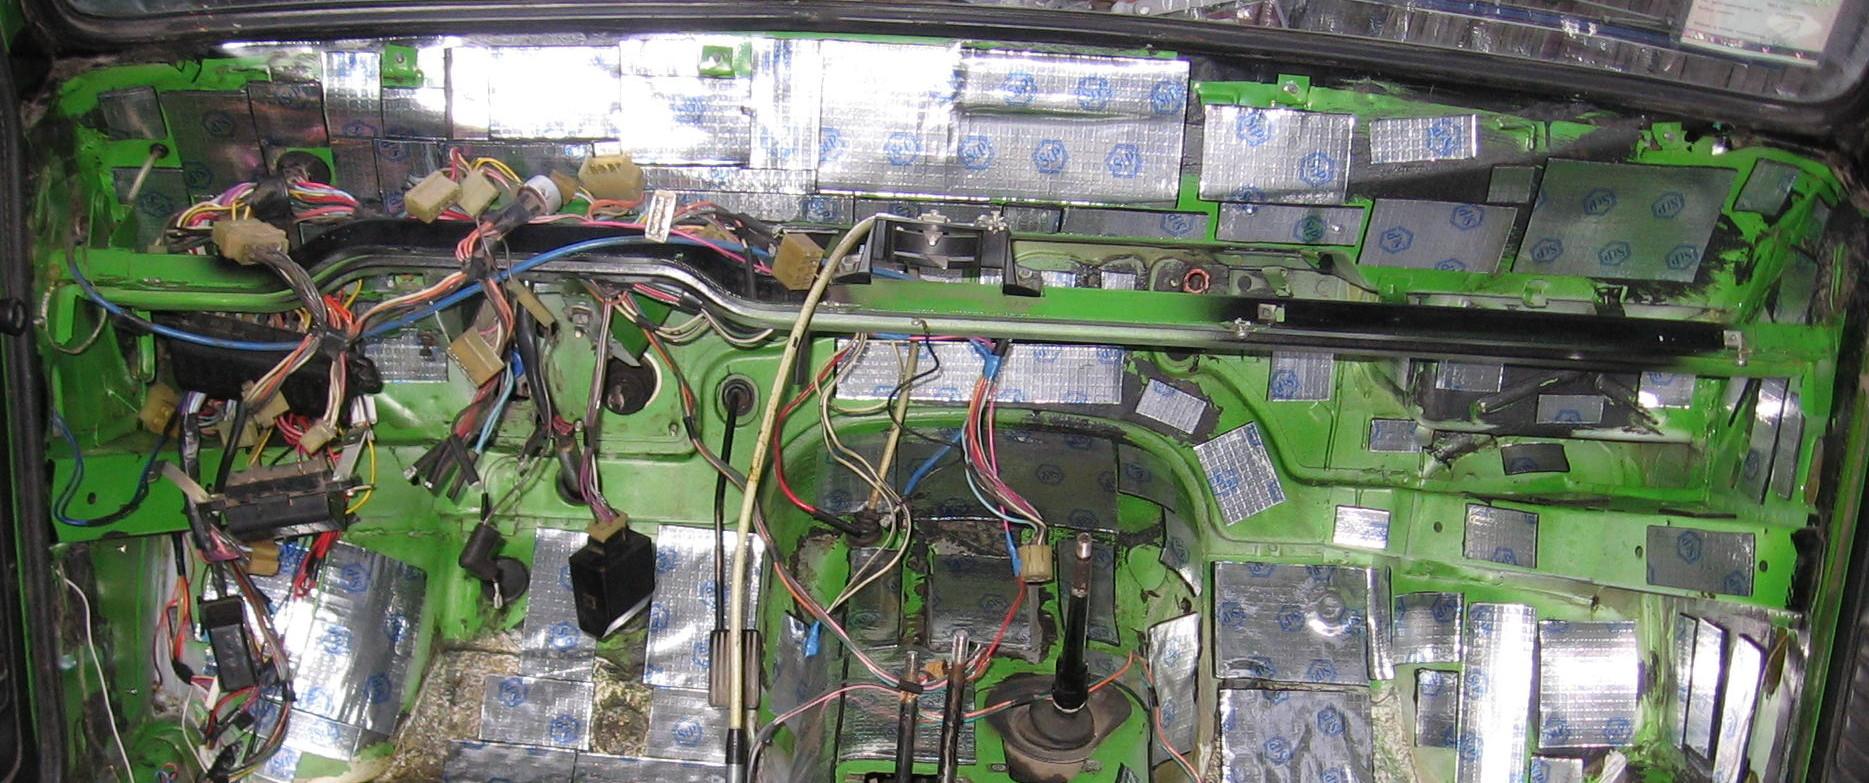 шумоизоляция и виброизоляция автомобиля-21